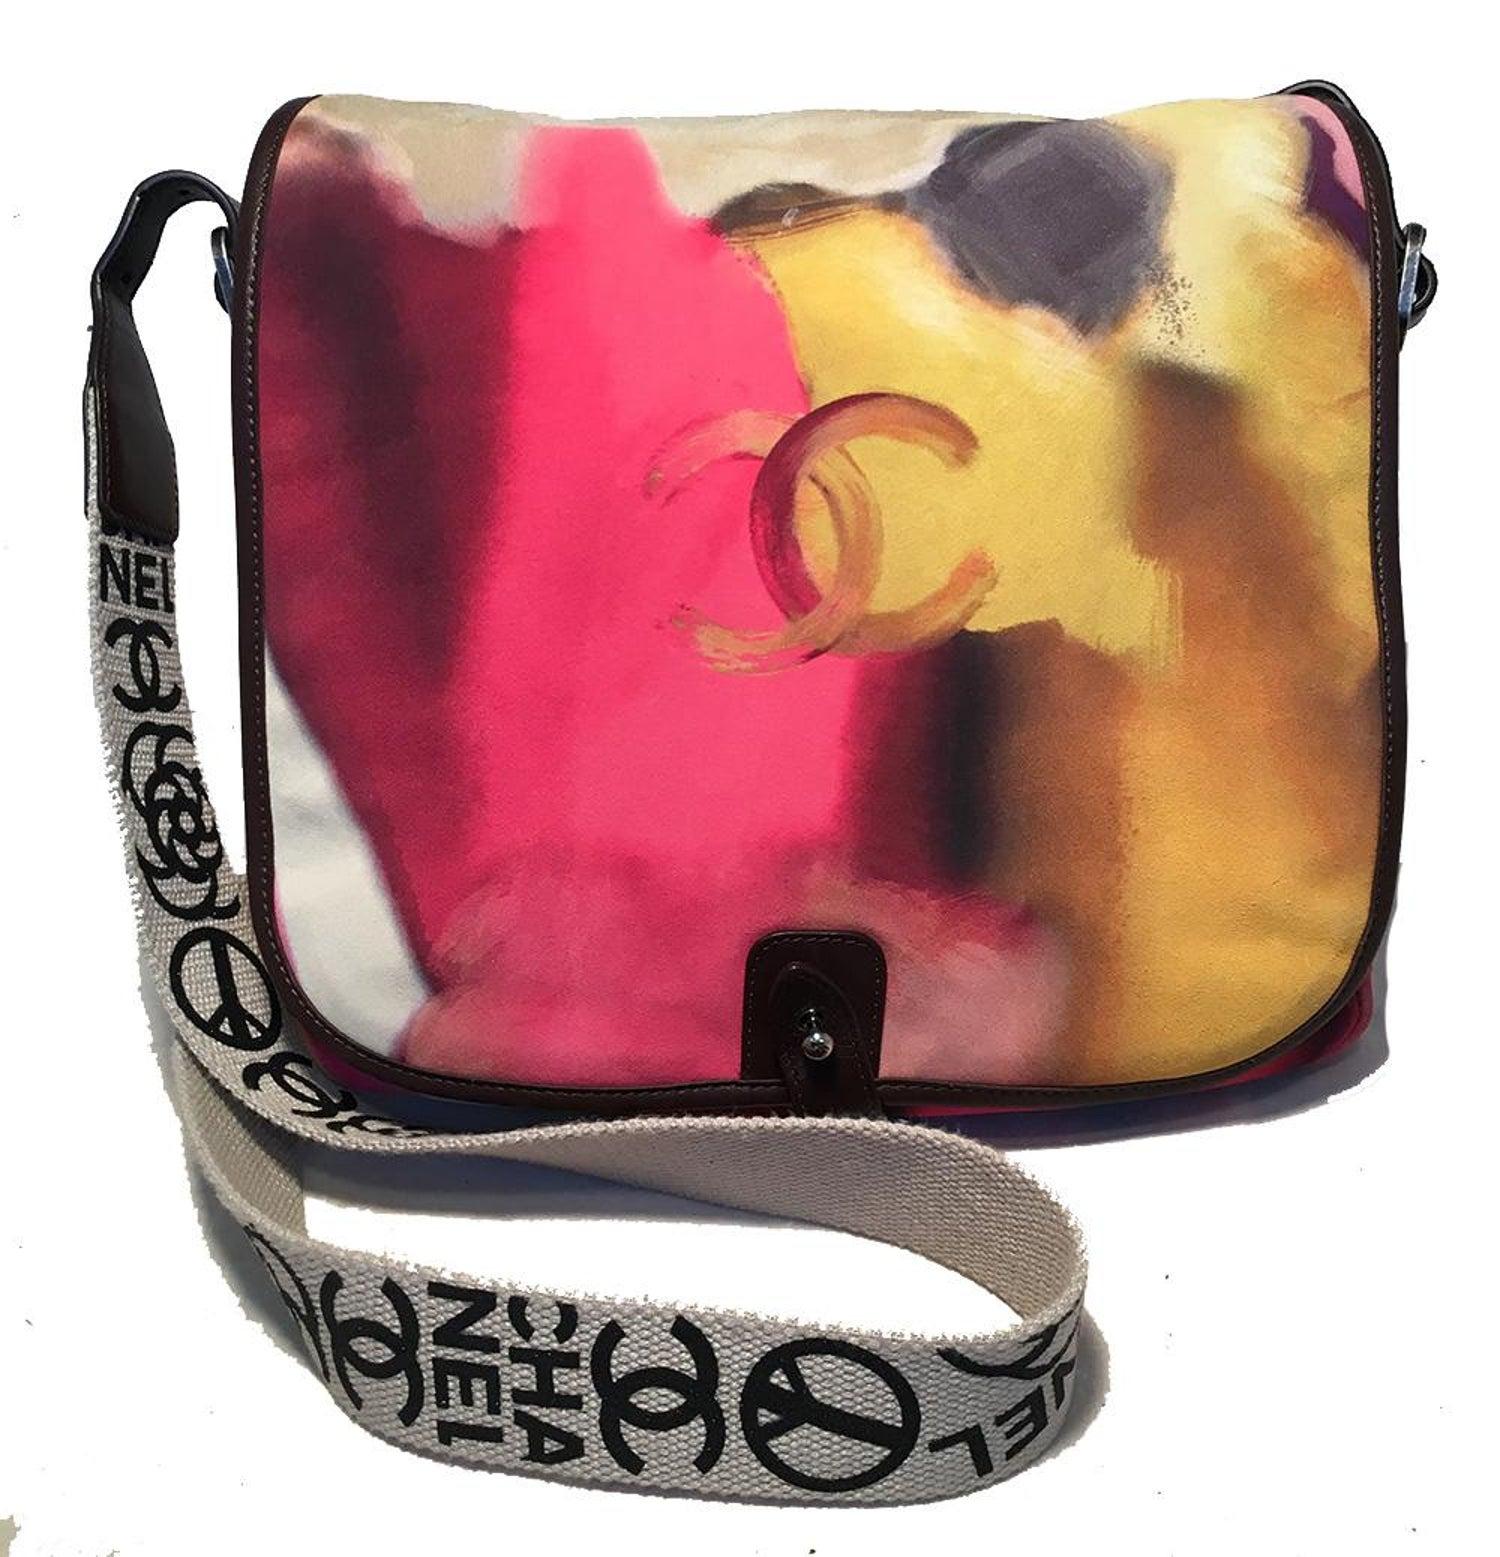 d9bbb410326a17 Chanel Flower Power Messenger Multicolor Nubuck Crossbody Shoulder Bag at  1stdibs